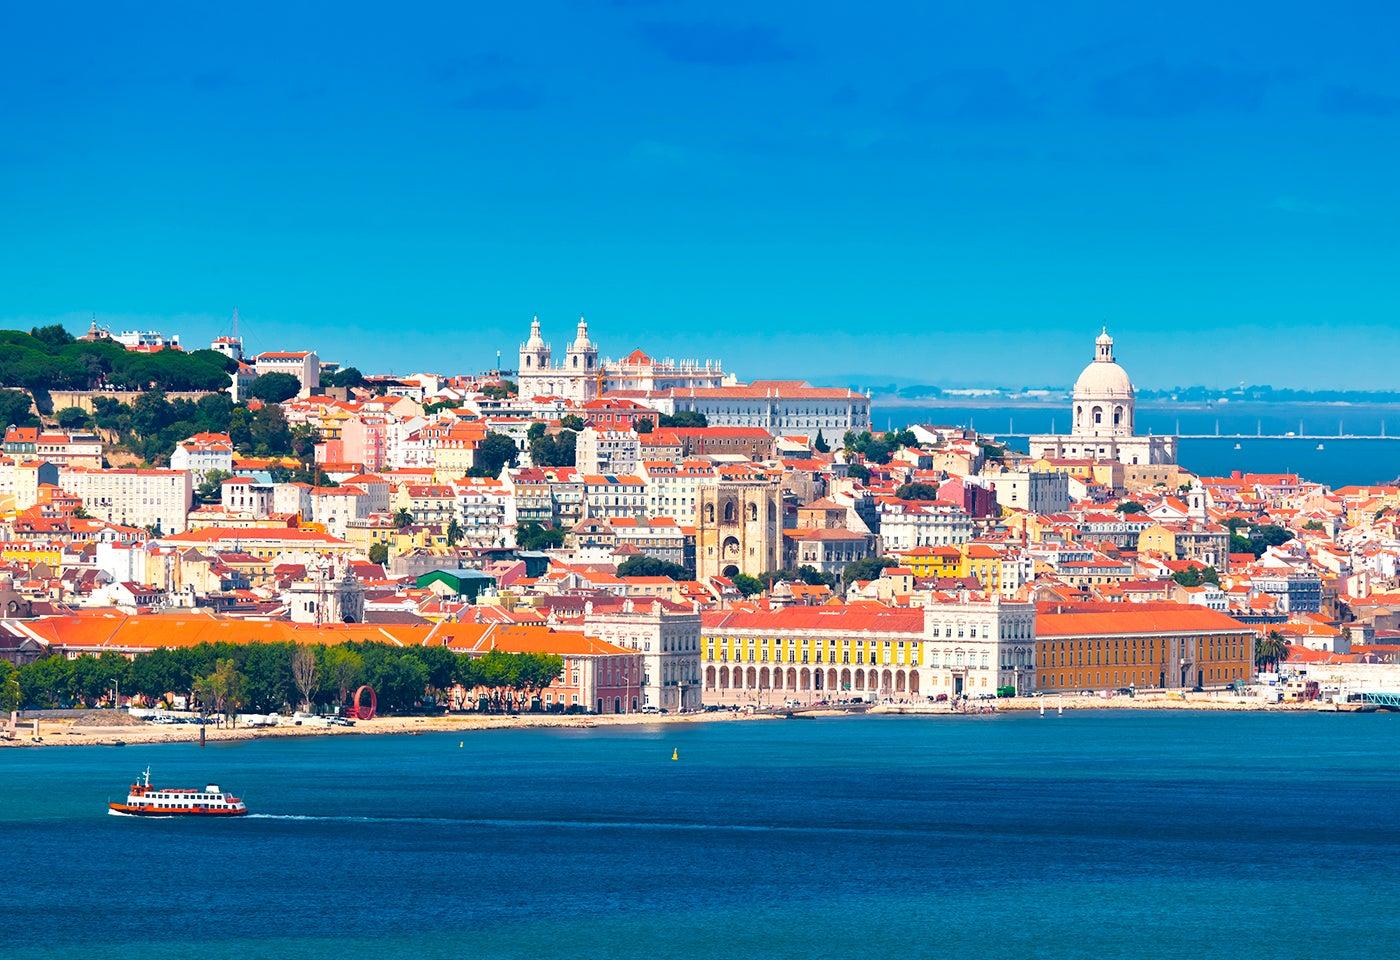 Lisboa, parada en una ruta por Europa en caravana